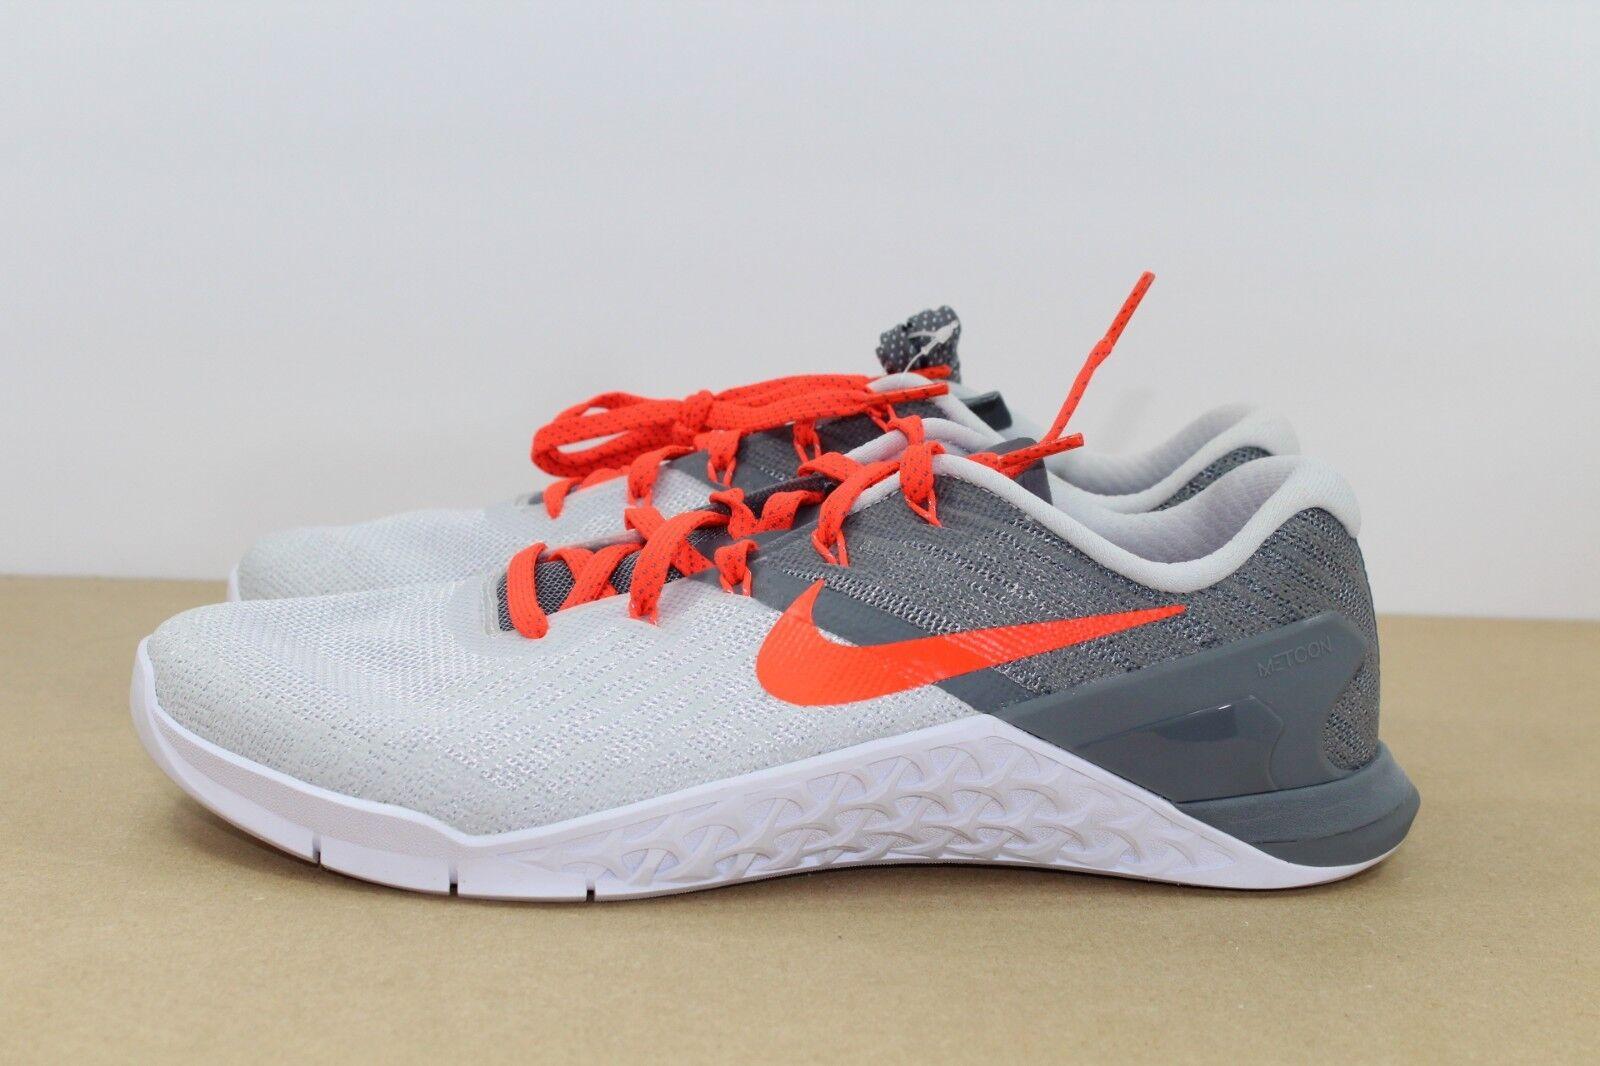 WMNS Nike Metcon 3 Running training Shoe Platinum/Crimson 849807-006 Size 9